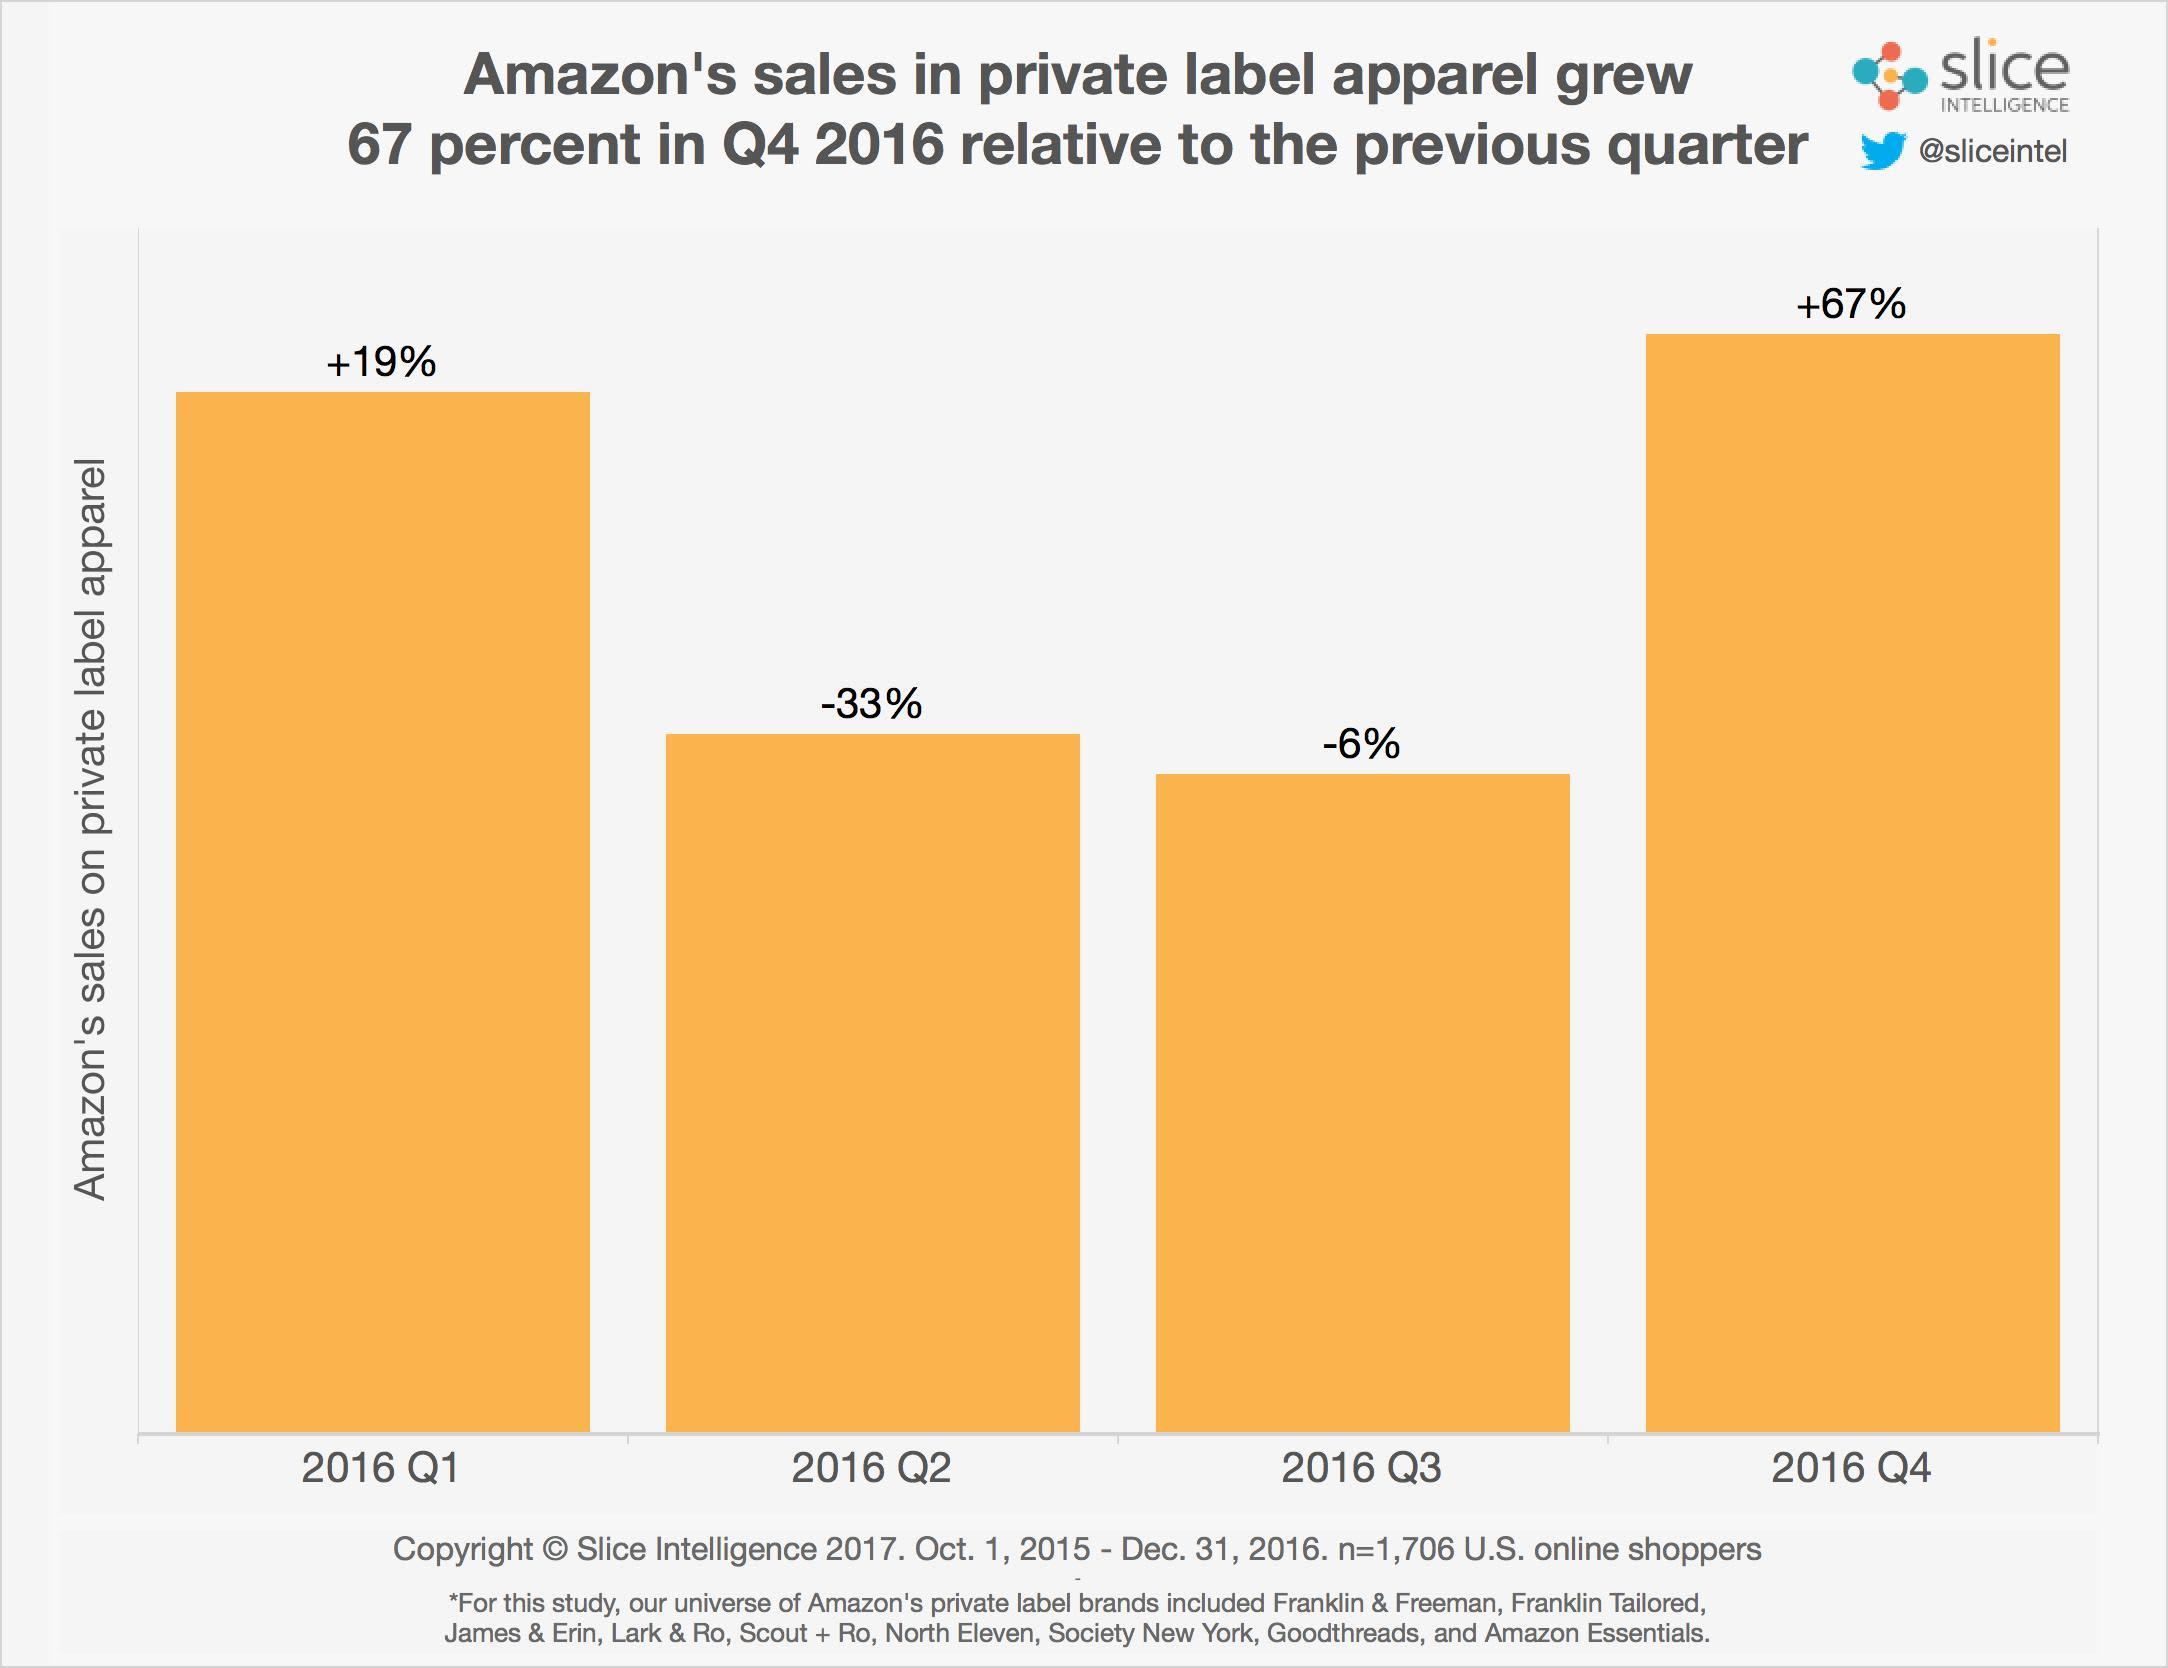 Amazon Sales in privat apparel